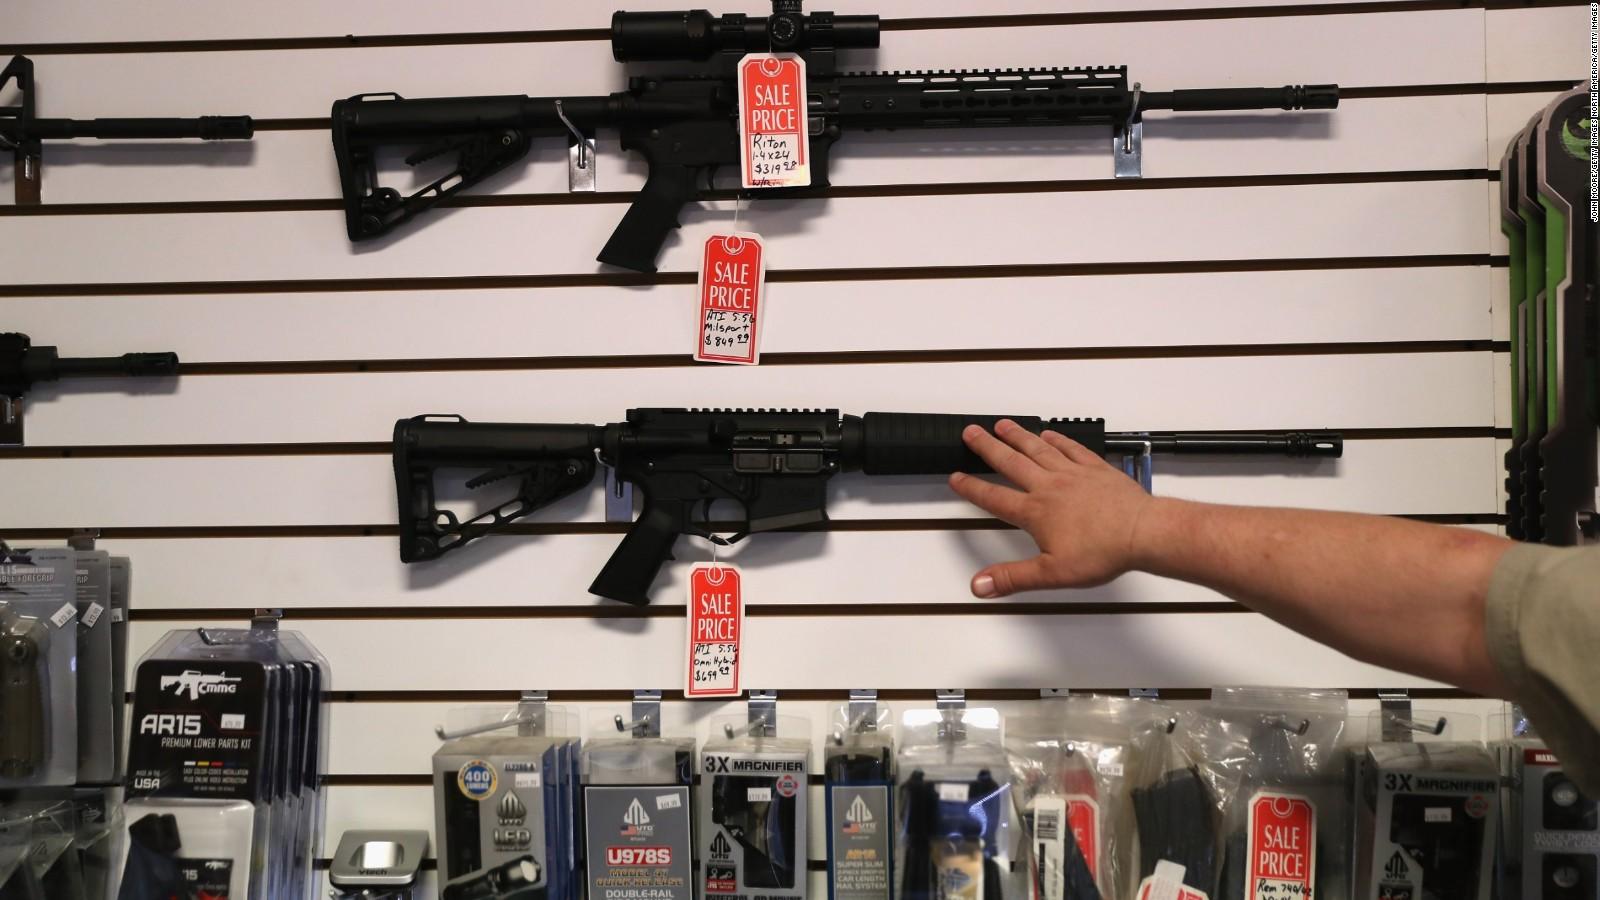 Bump stock The device found on Las Vegas shooters guns CNN